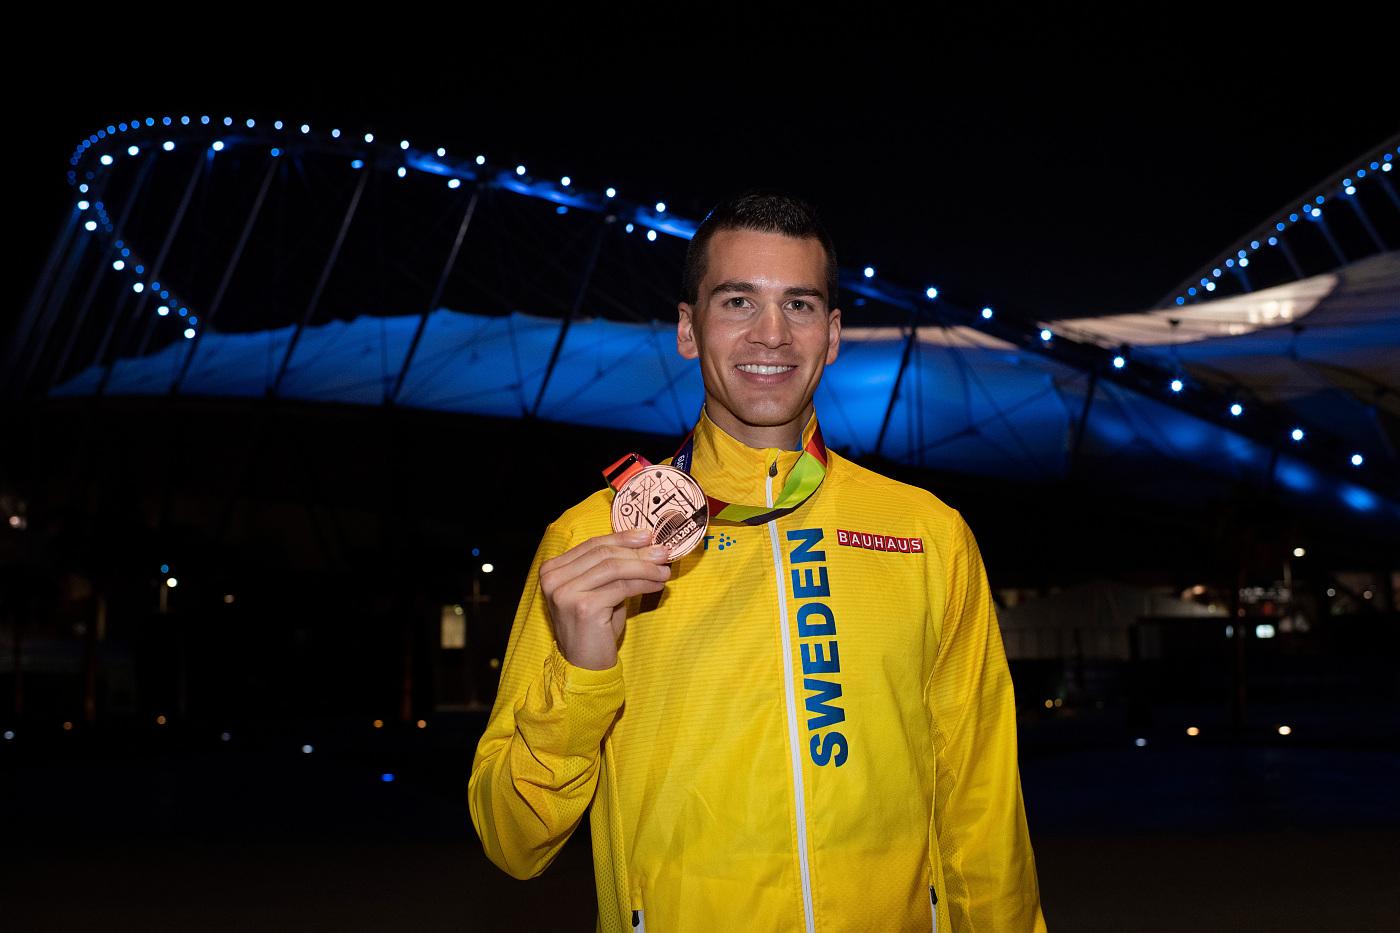 OS-hoppet vann säsongspremiären på supertid